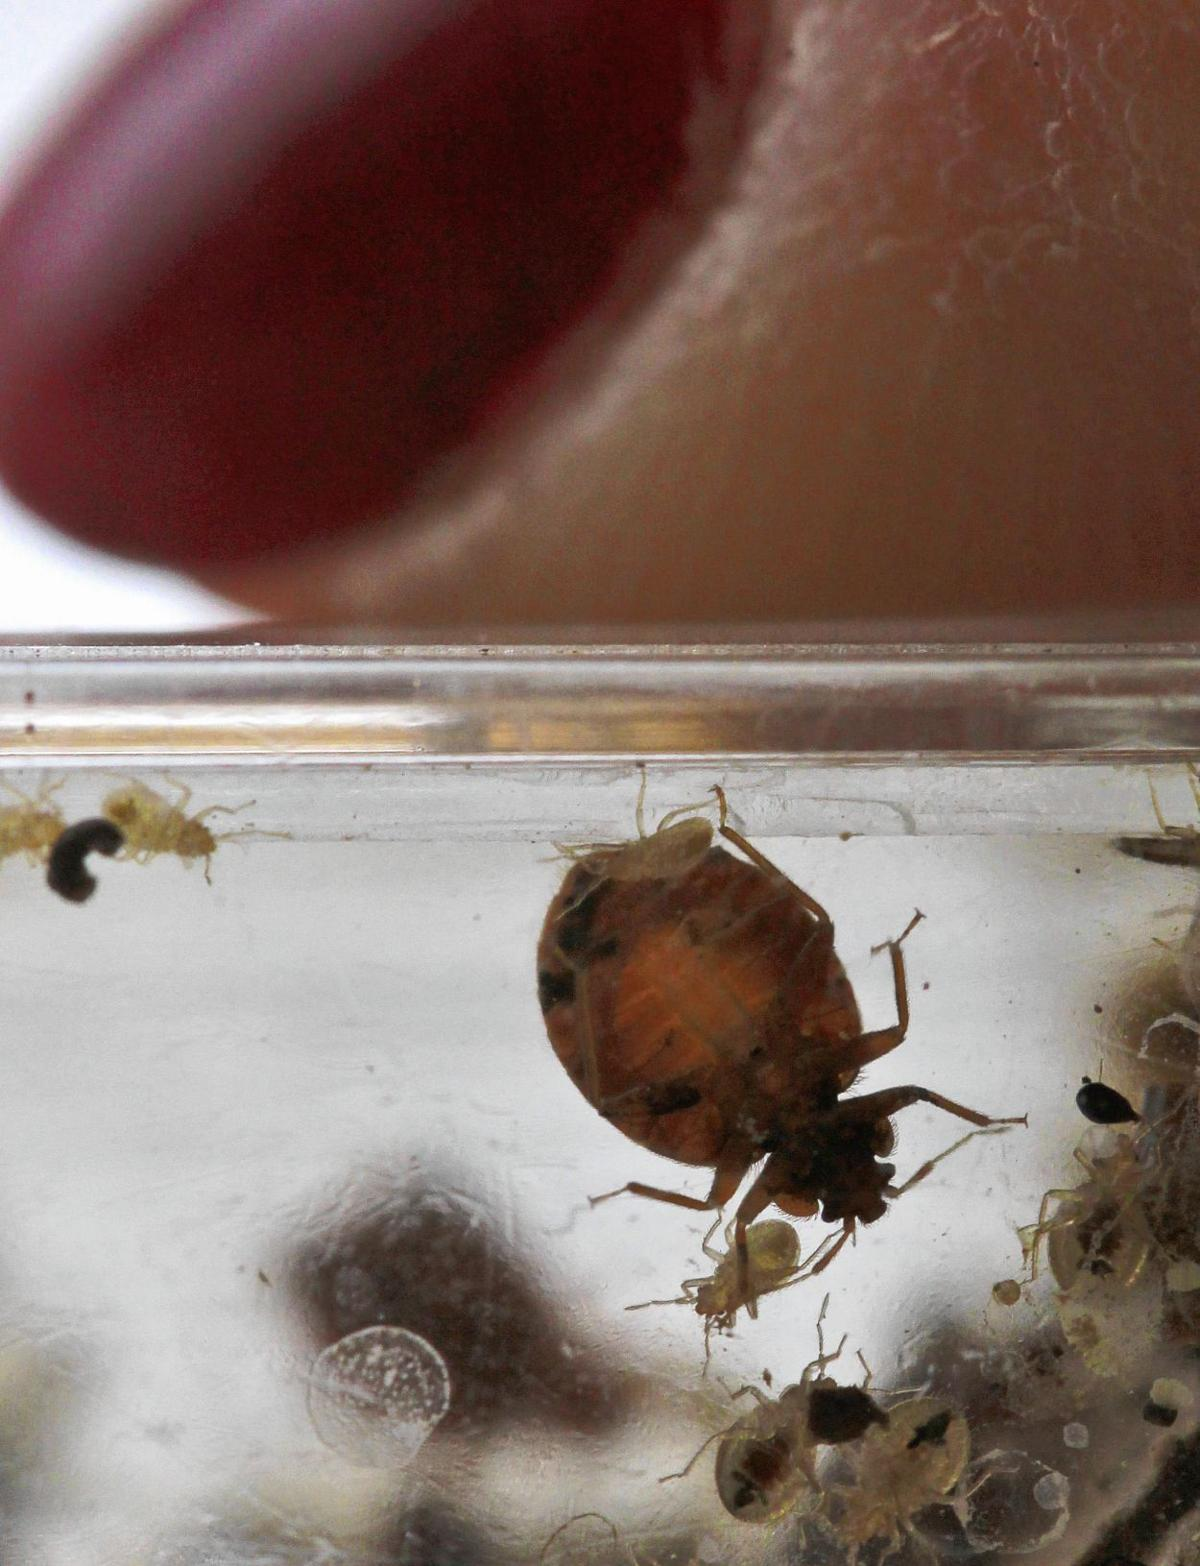 Tiny bugs, big problem